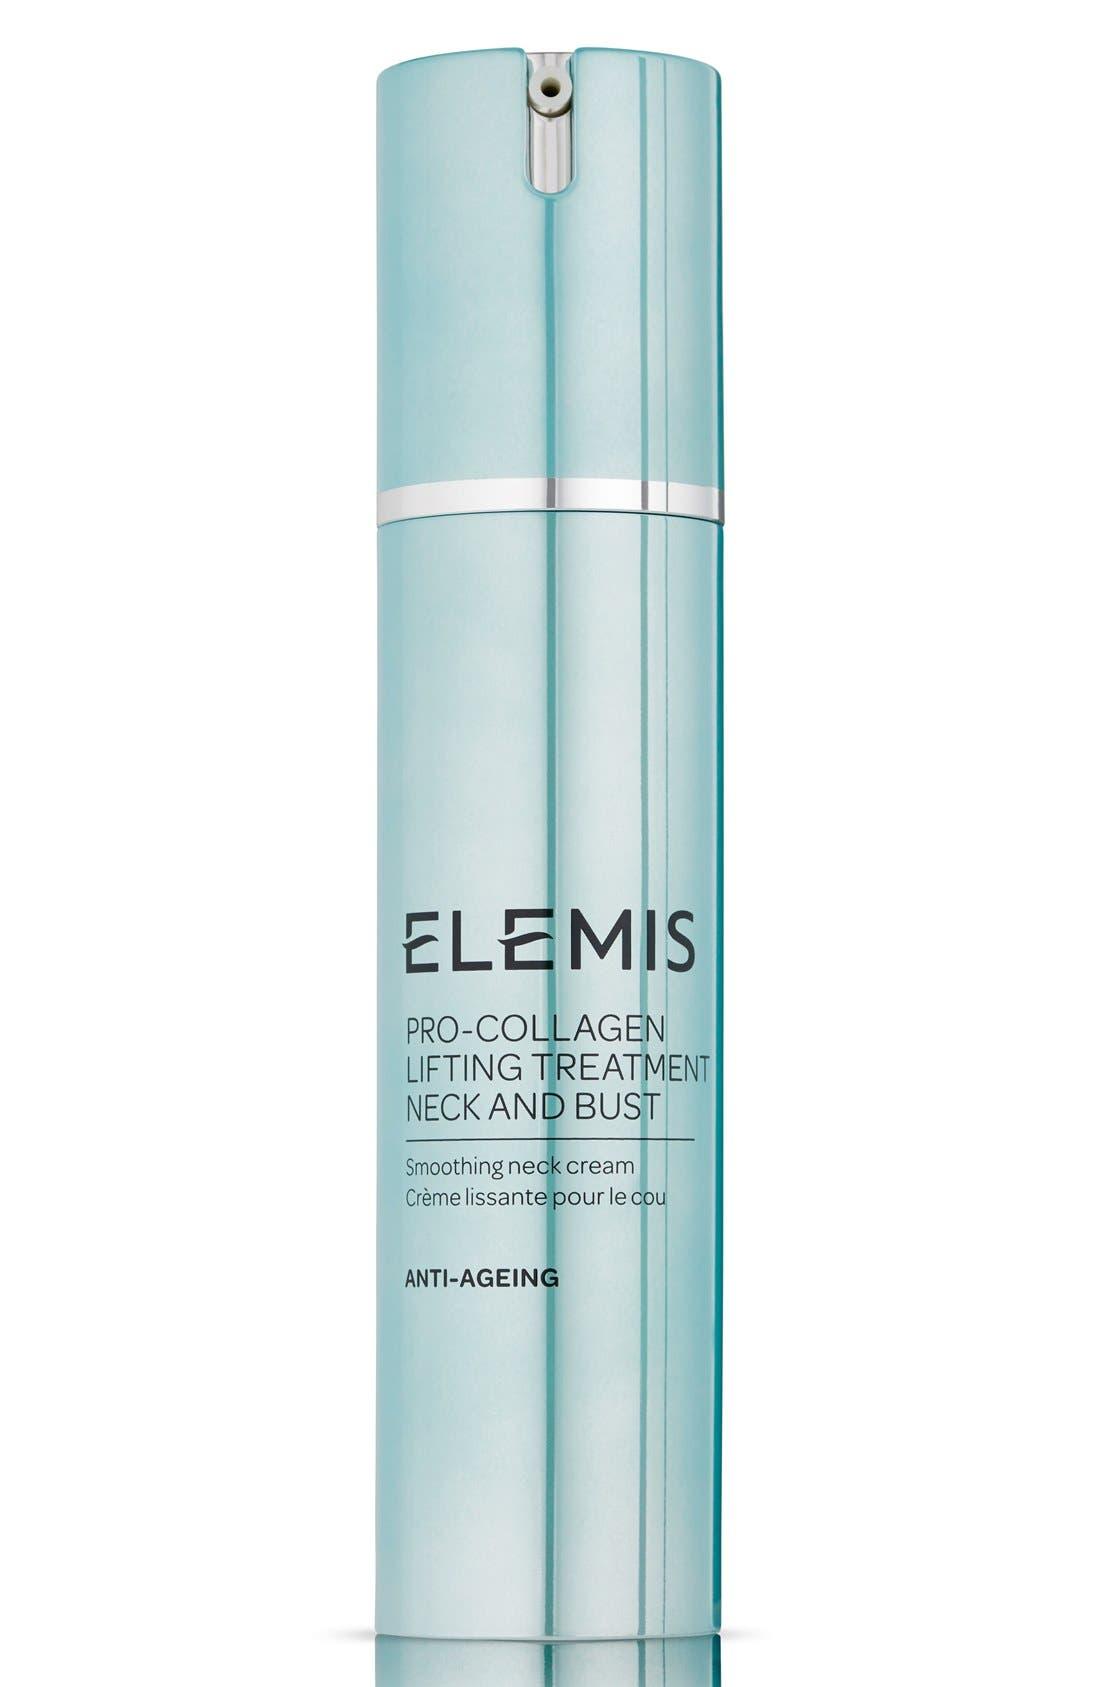 Elemis Pro-Collagen Lifting Treatment Neck & Bust